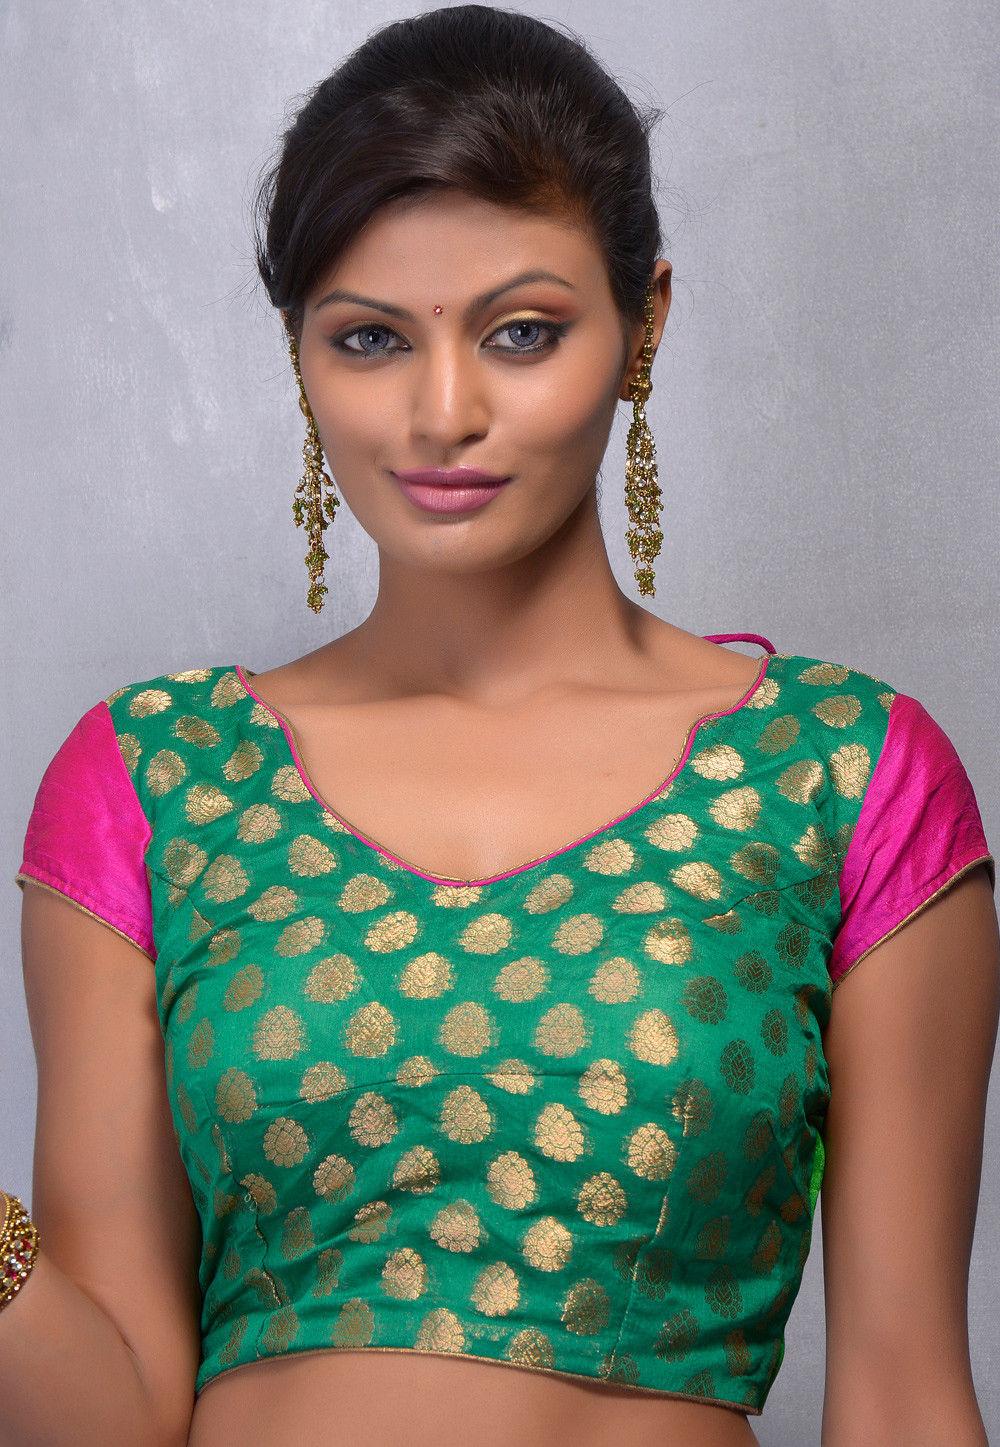 Woven Chanderi Art Silk Blouse in Green